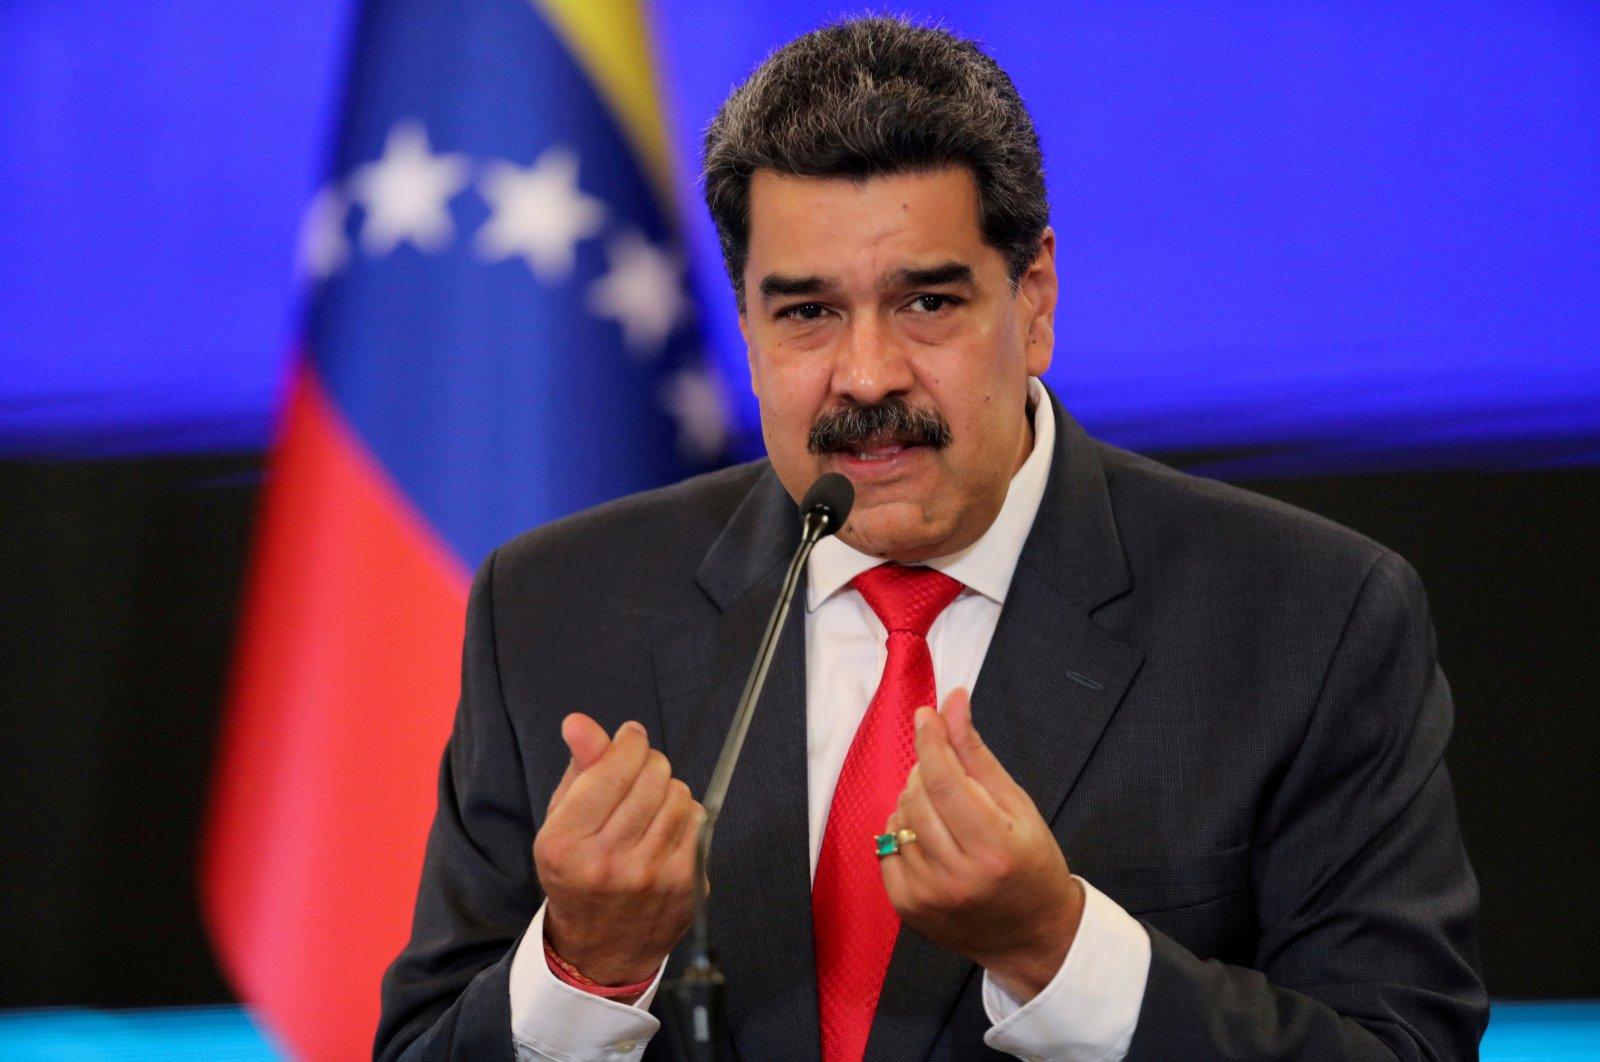 Venezuelan President Nicolas Maduro gestures as he speaks during a news conference in Caracas, Venezuela, Dec. 8, 2020. (Reuters Photo)